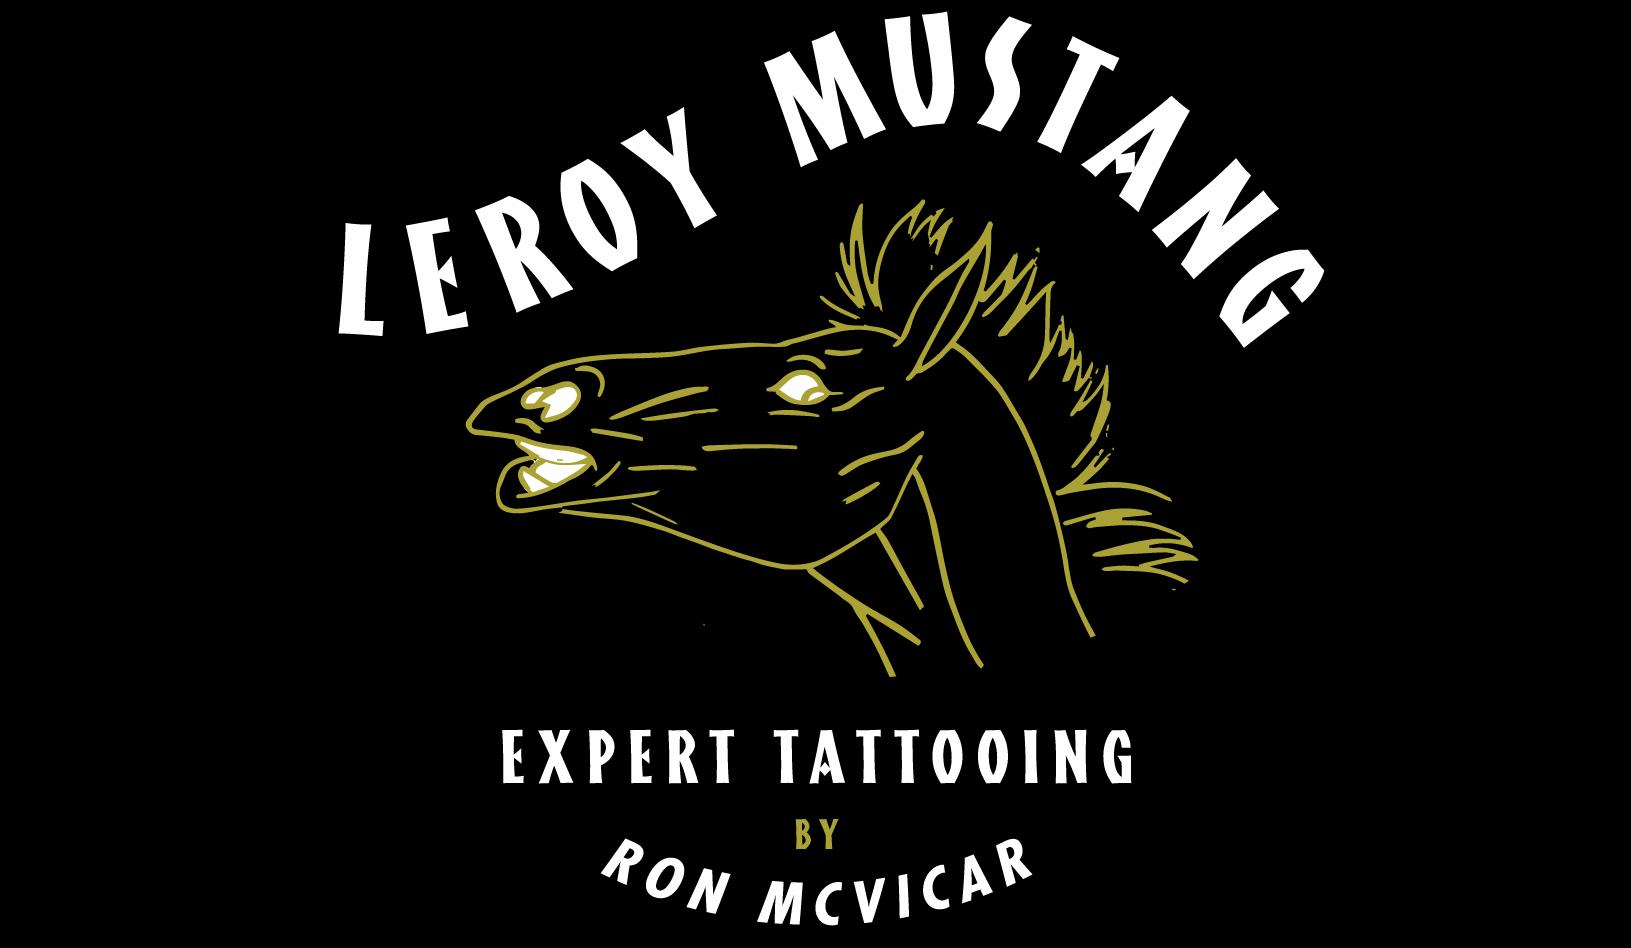 leroy-mustang-logo-home.png